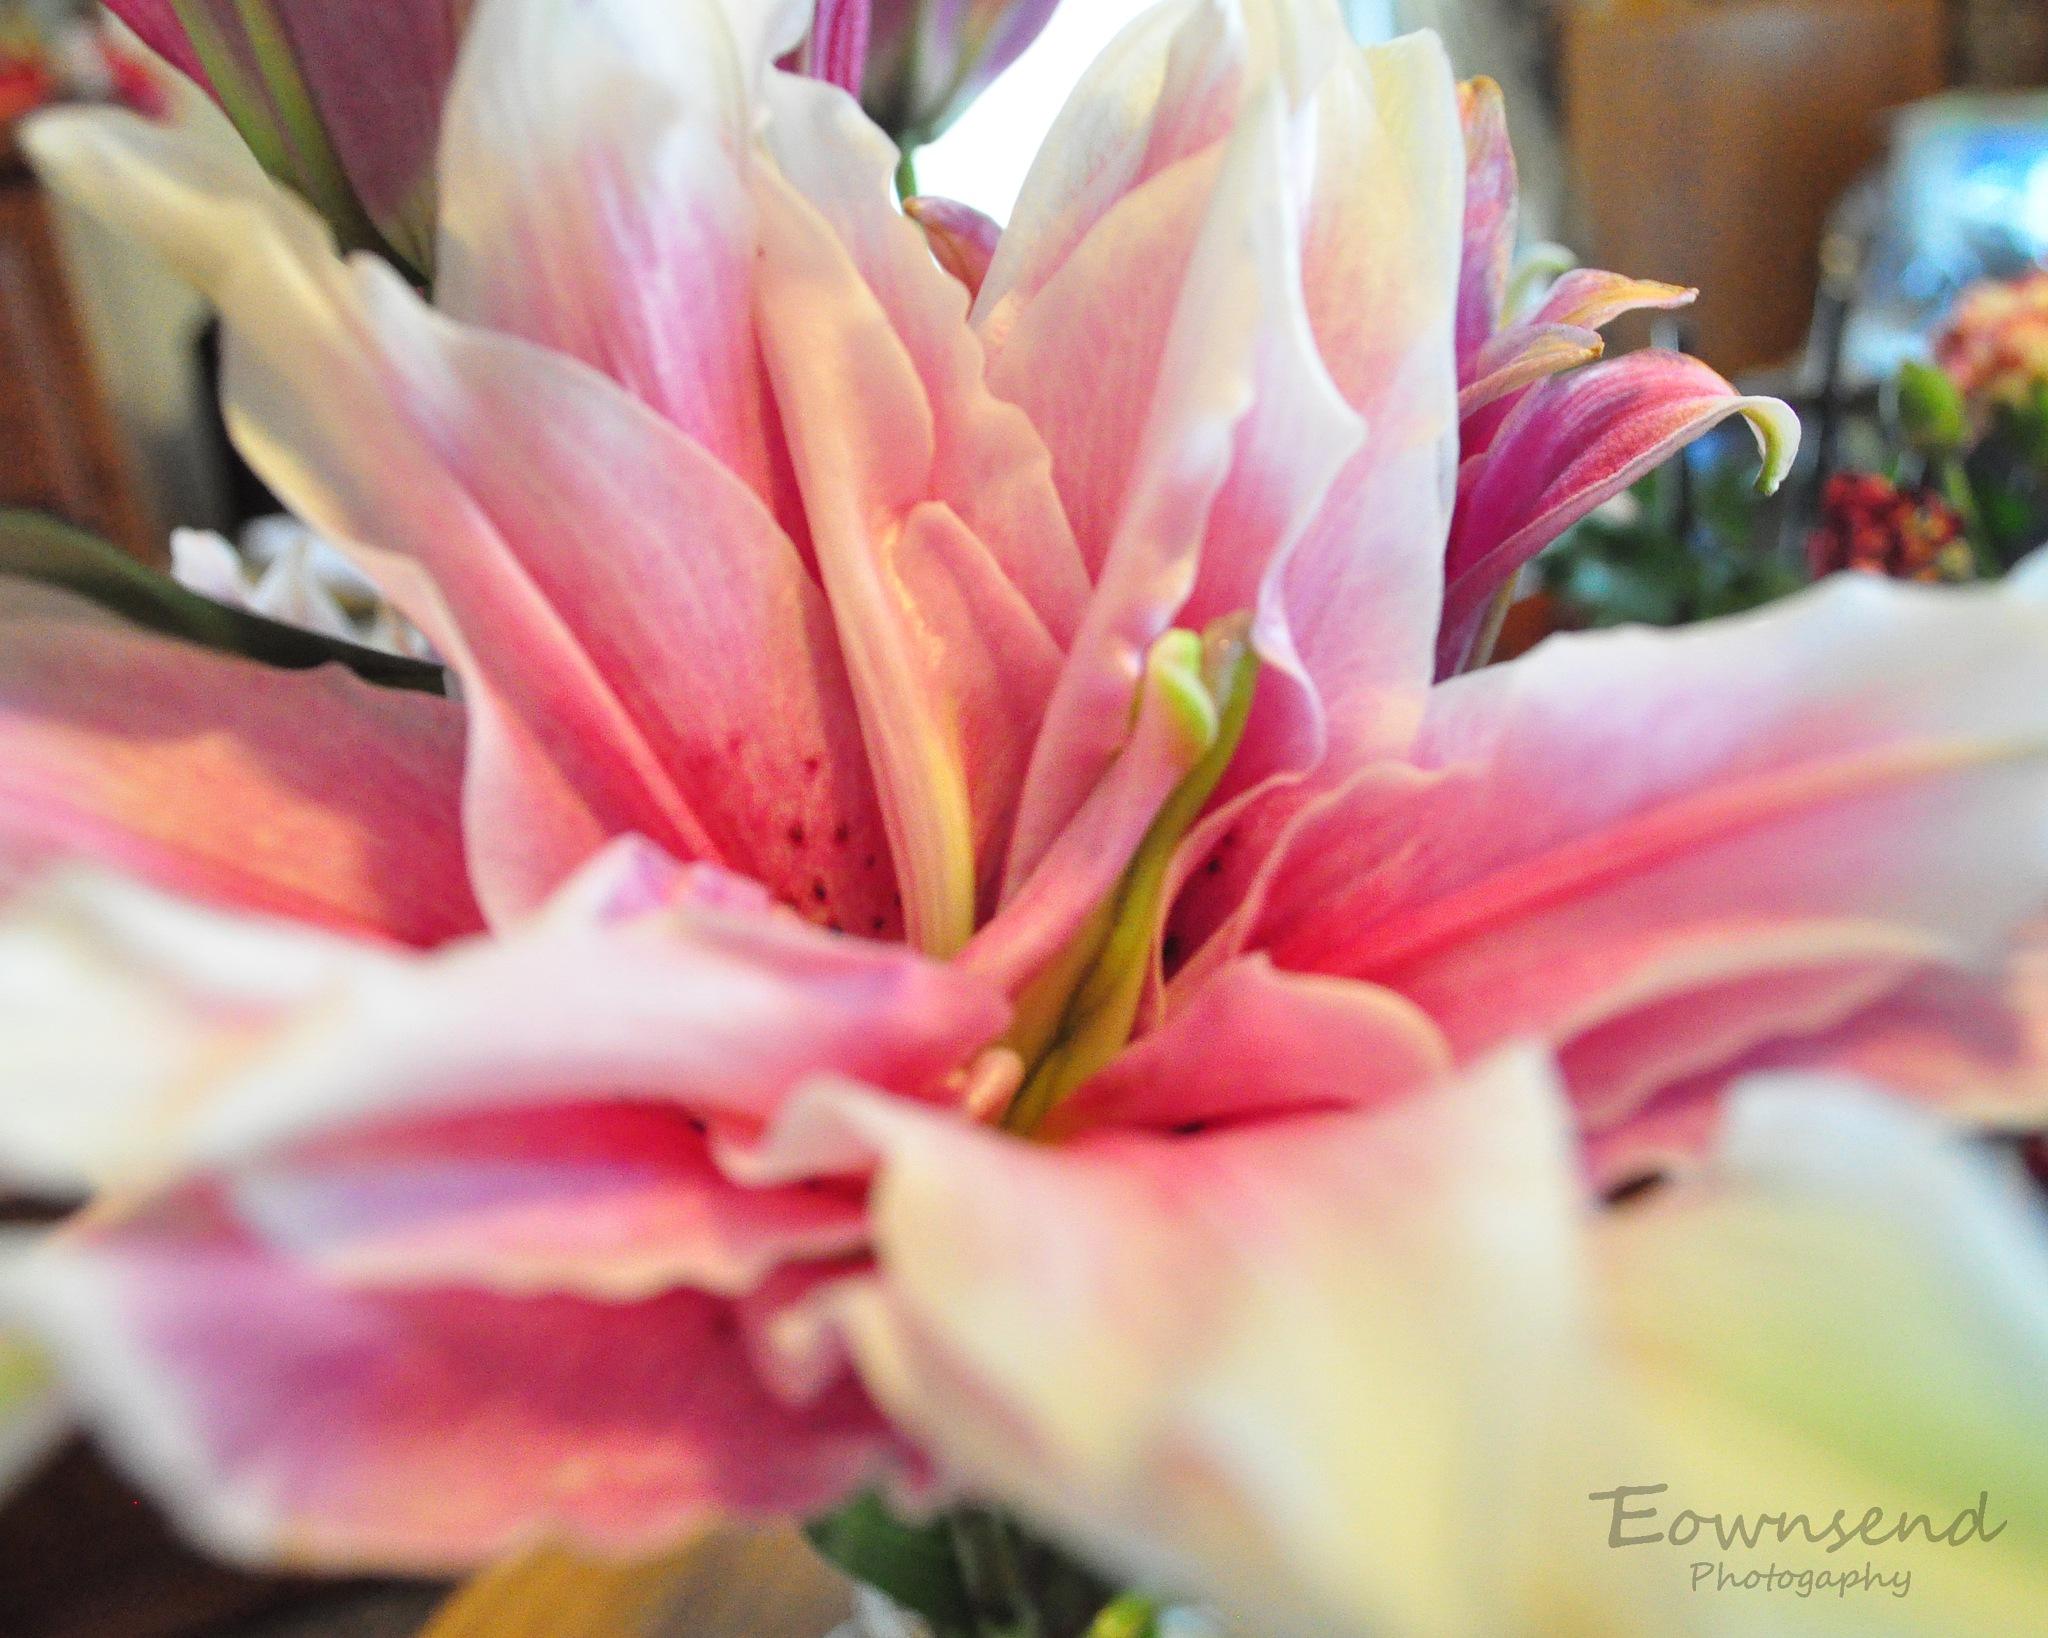 Roselily by Elizabeth C. Townsend